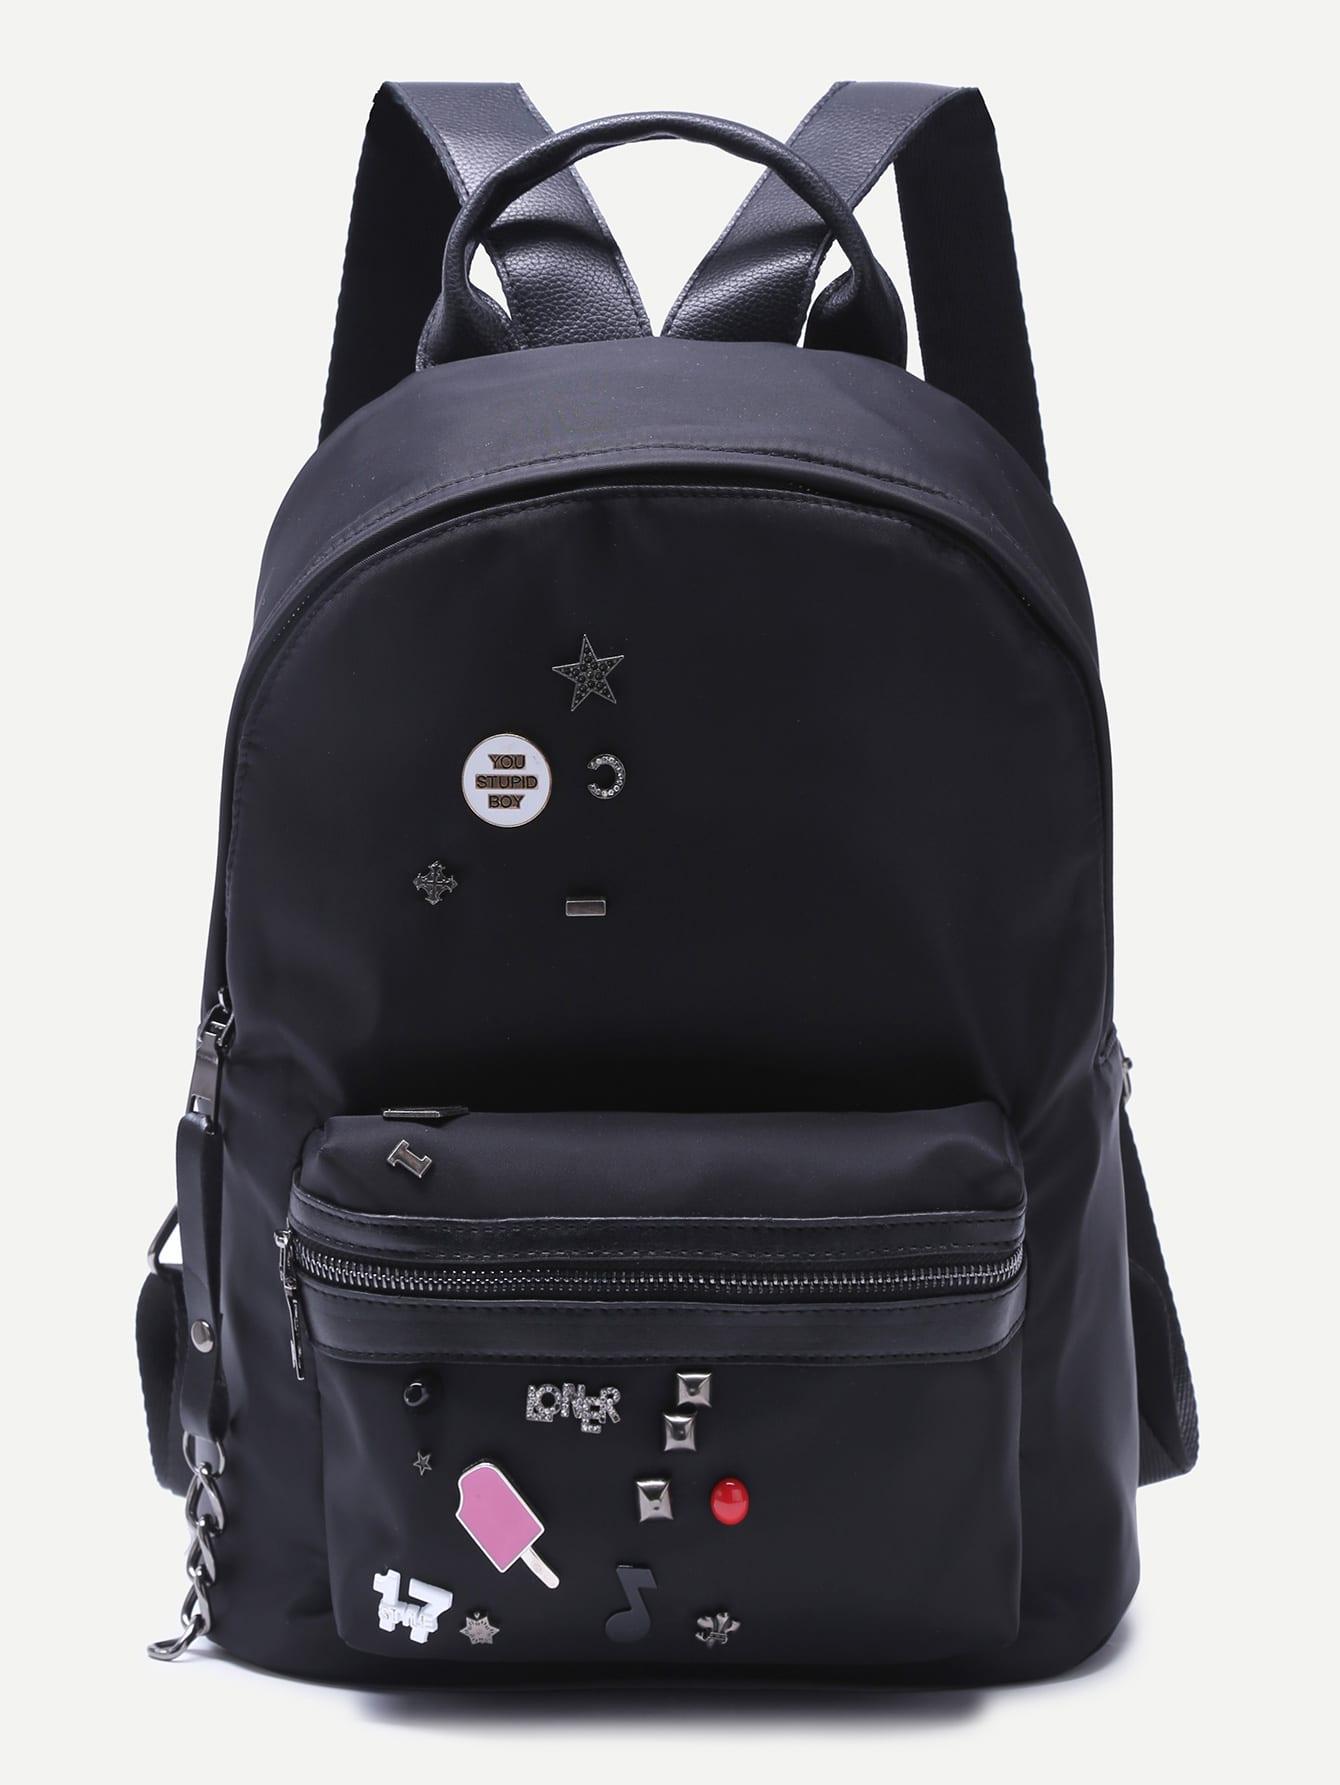 bag161111912_2